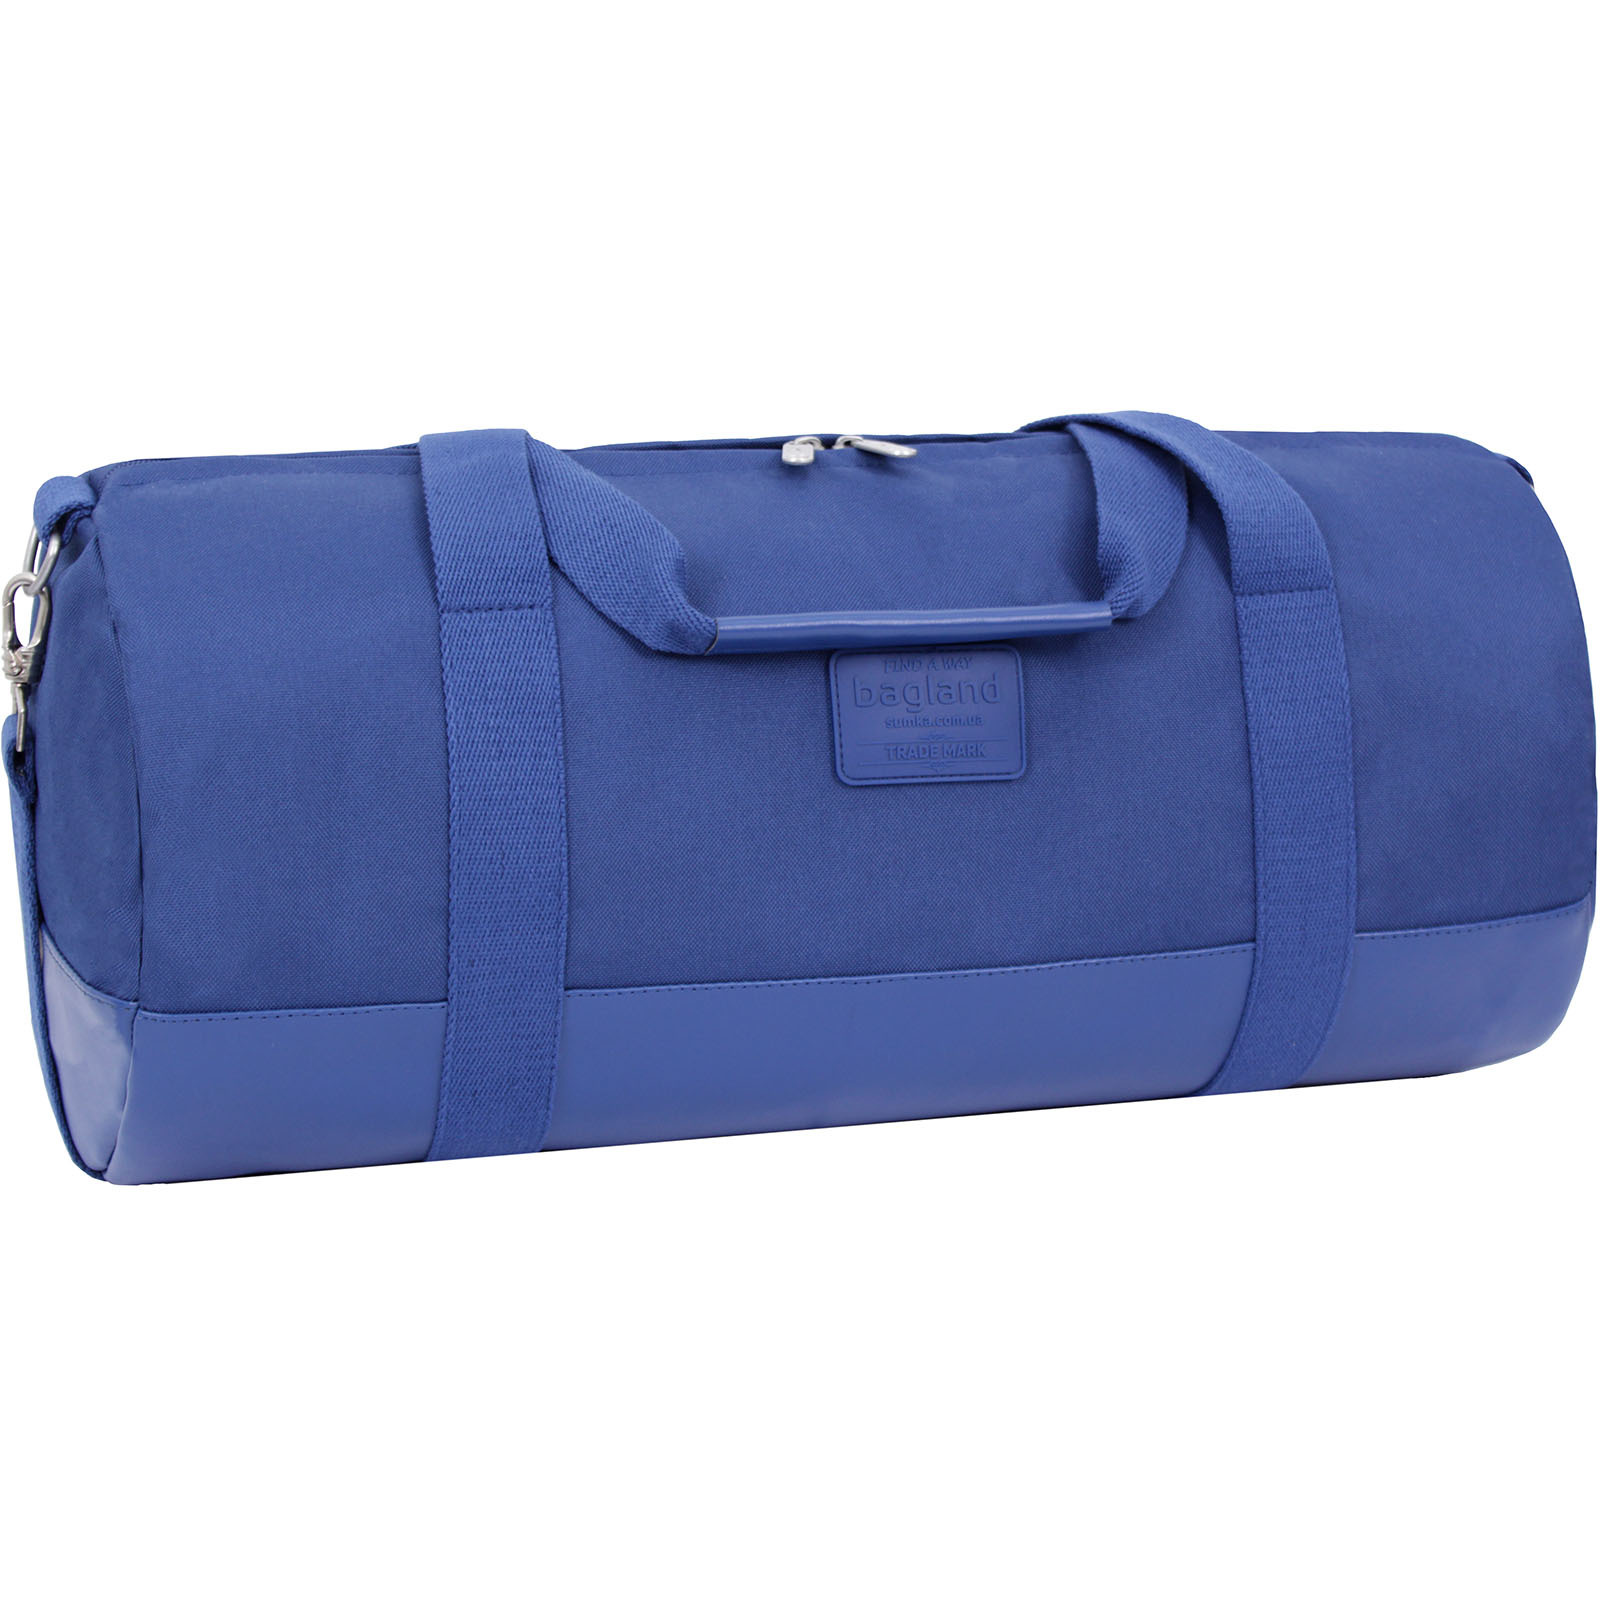 Спортивные сумки Сумка Bagland Staff + косметичка 30 л. Синий (00300663) IMG_2989.JPG